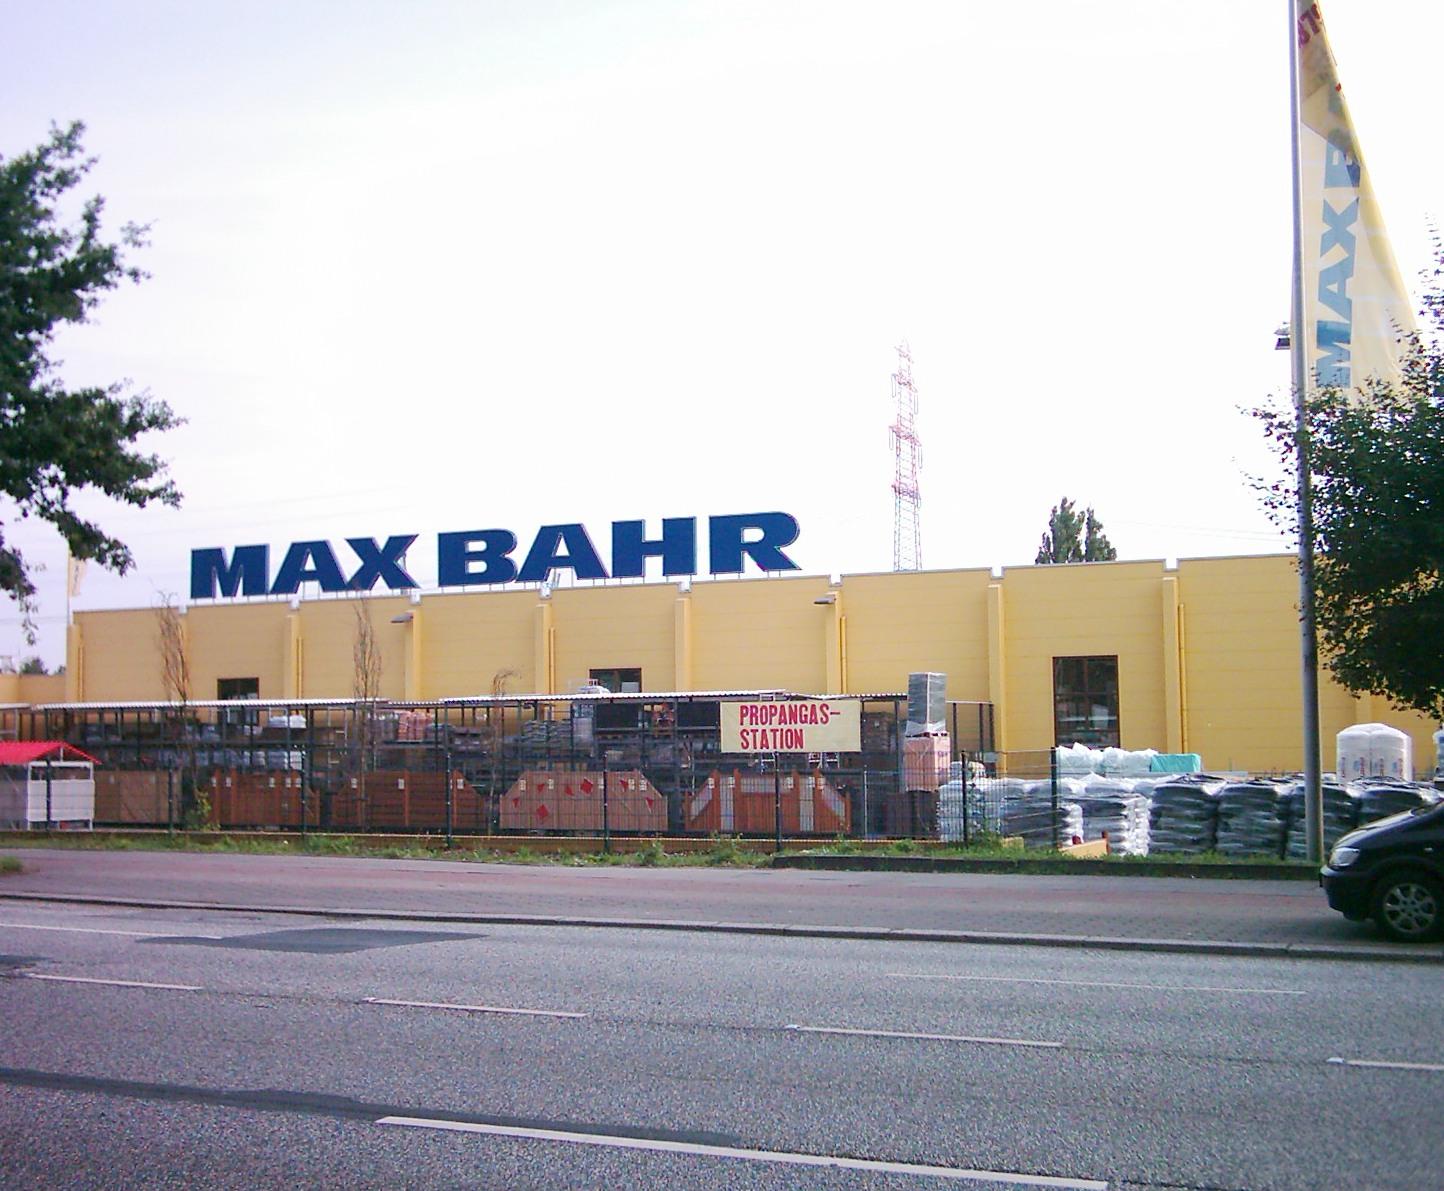 file:max bahr harburg 02 - wikimedia commons